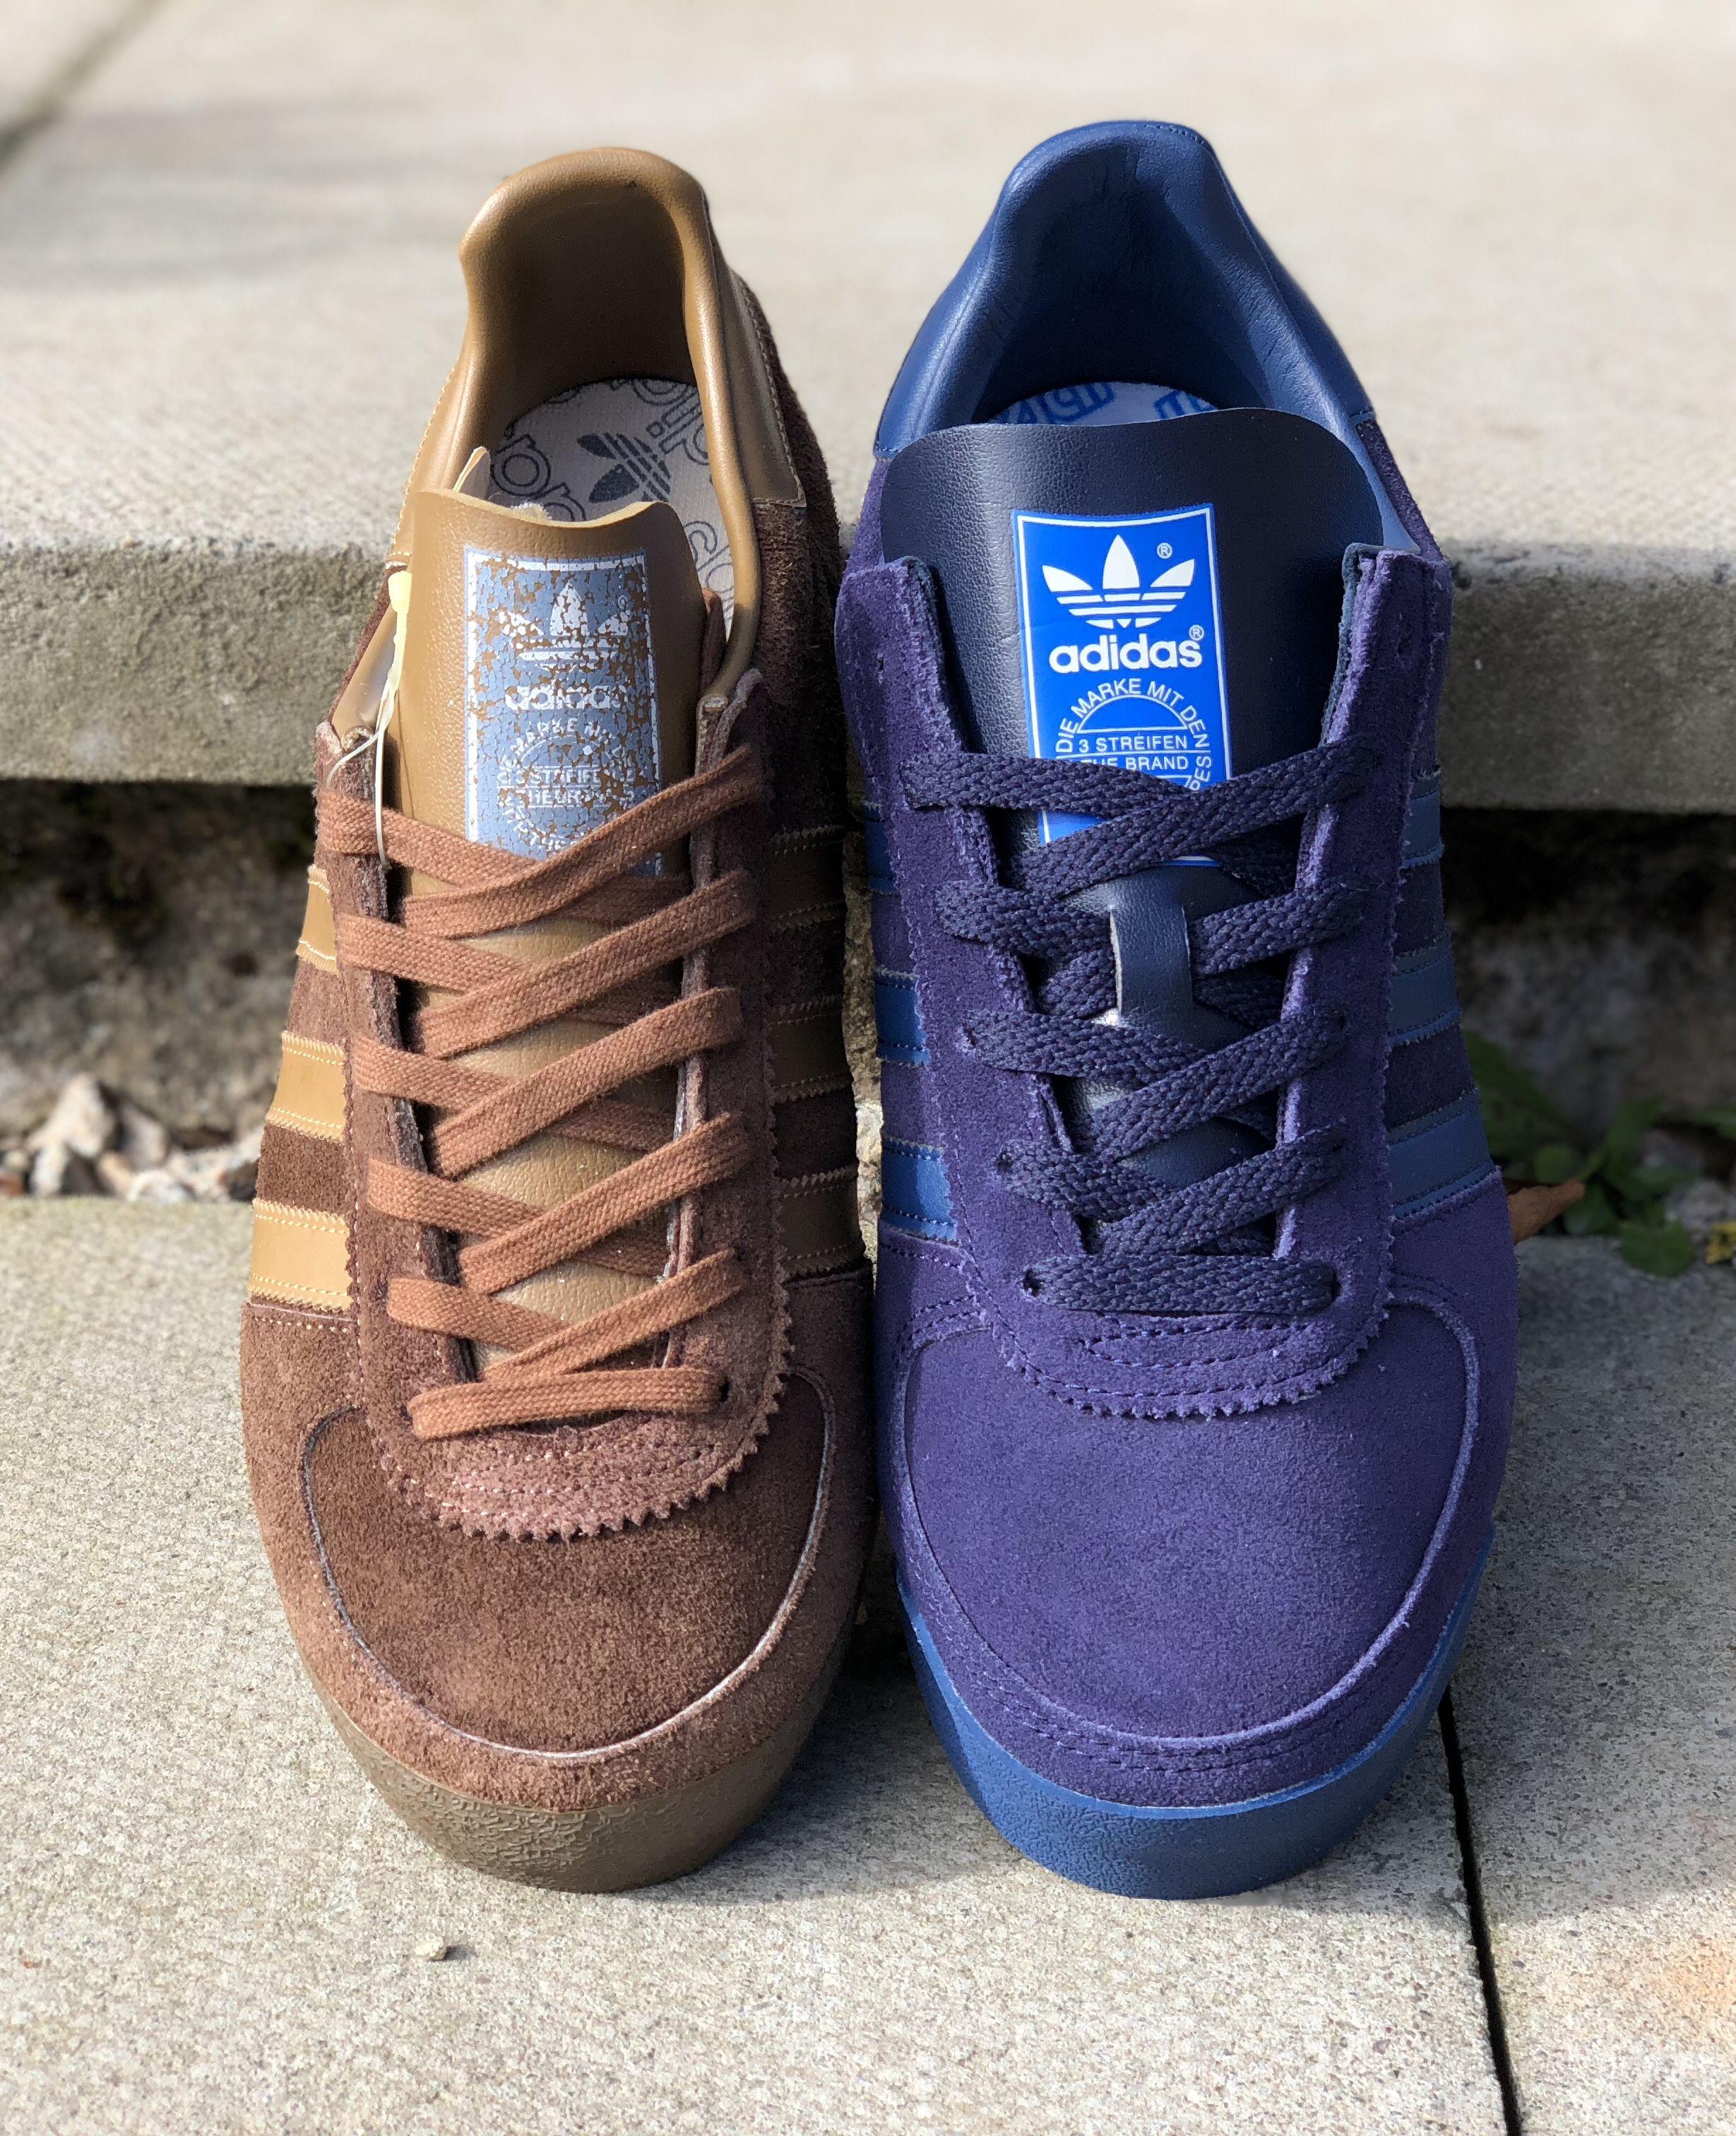 Adidas AS520 Spzl vs AS500 | Sneakers